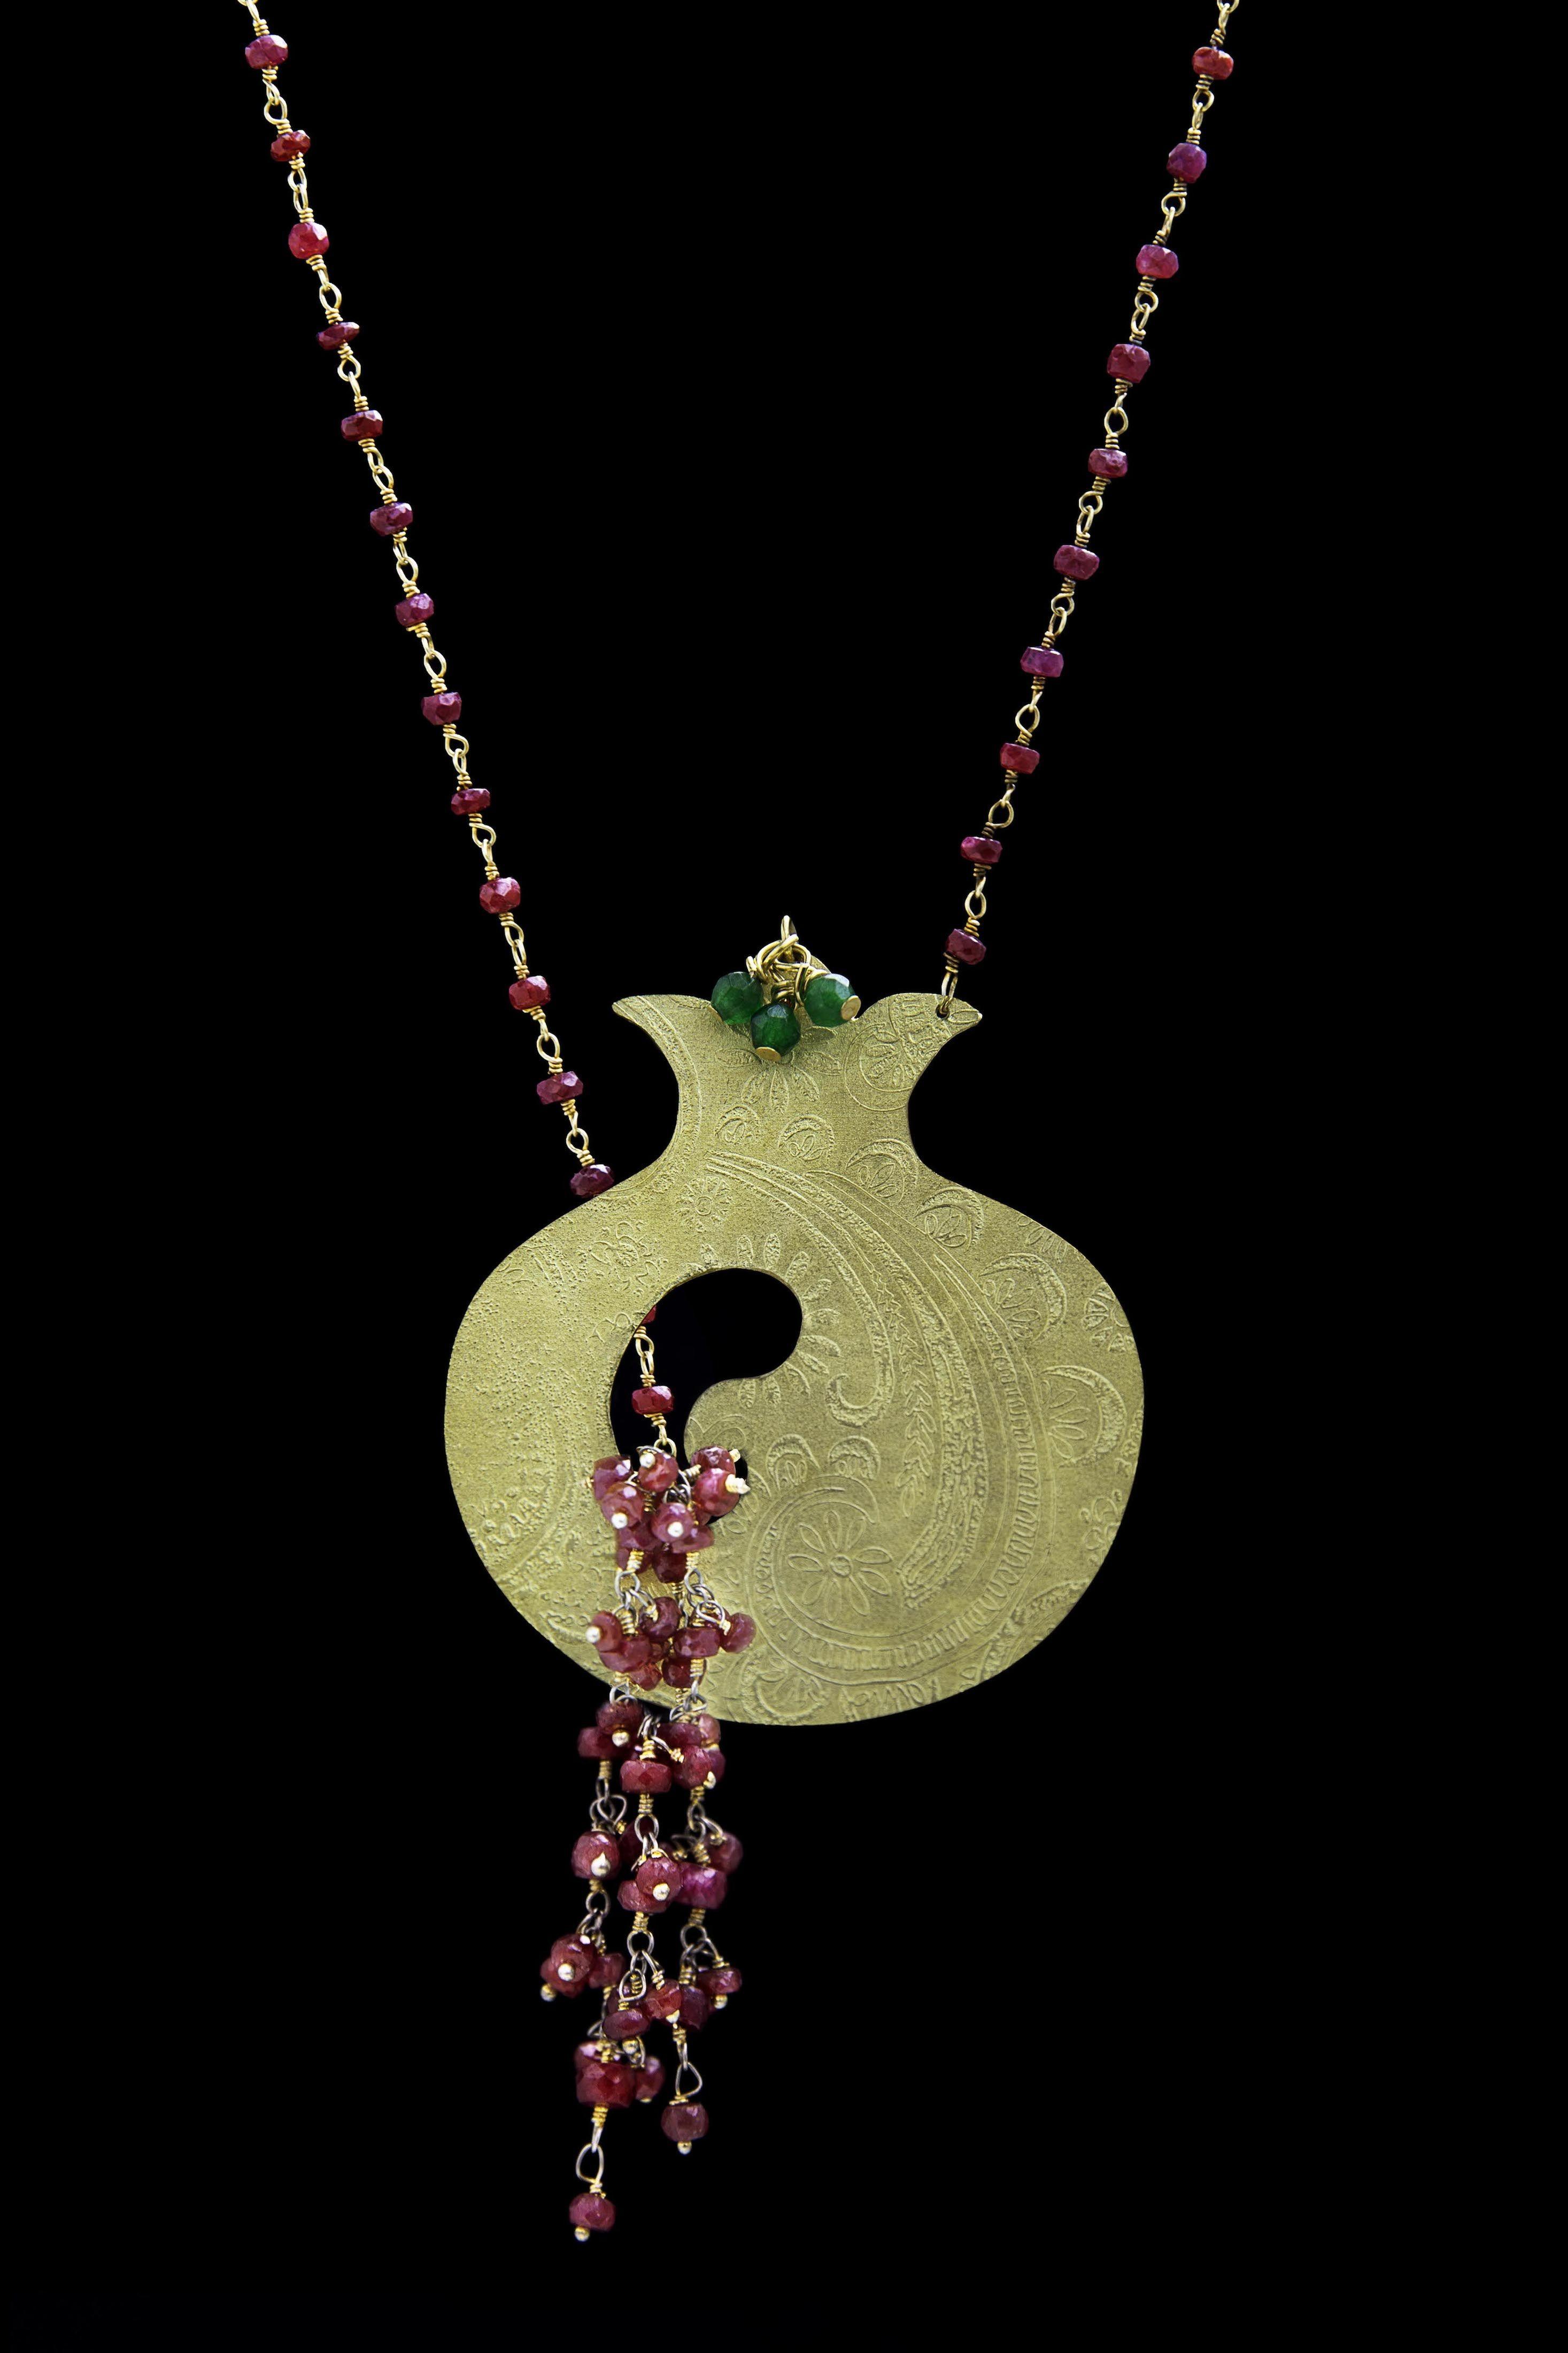 Pomegranate Candy Link Chain Necklace 8CvJU